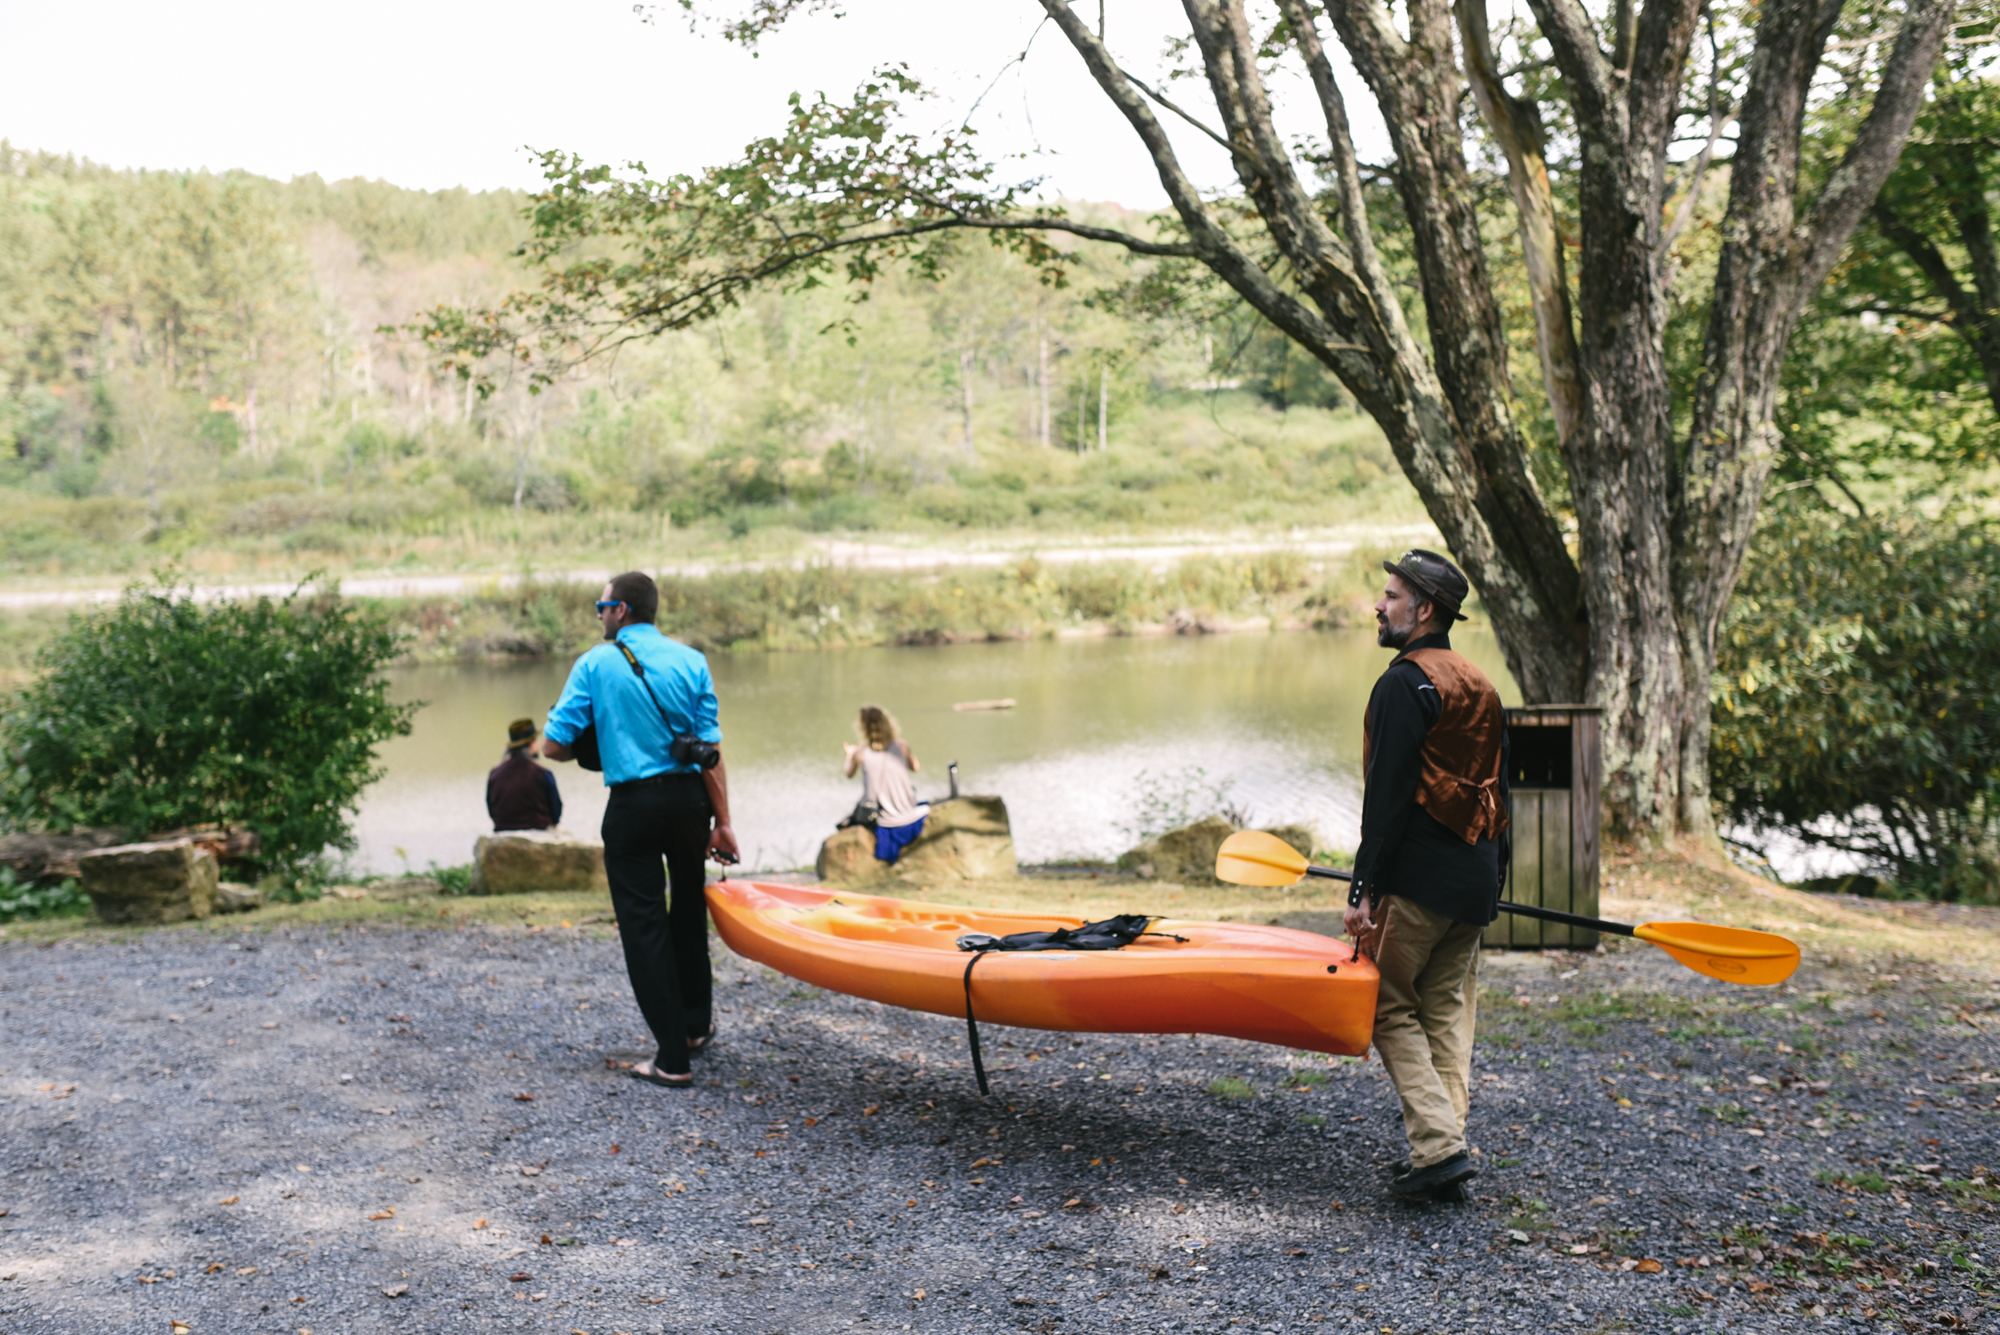 Mountain Wedding, Outdoors, Rustic, West Virginia, Maryland Wedding Photographer, DIY, Casual, Guests getting kayak, Blackwater River